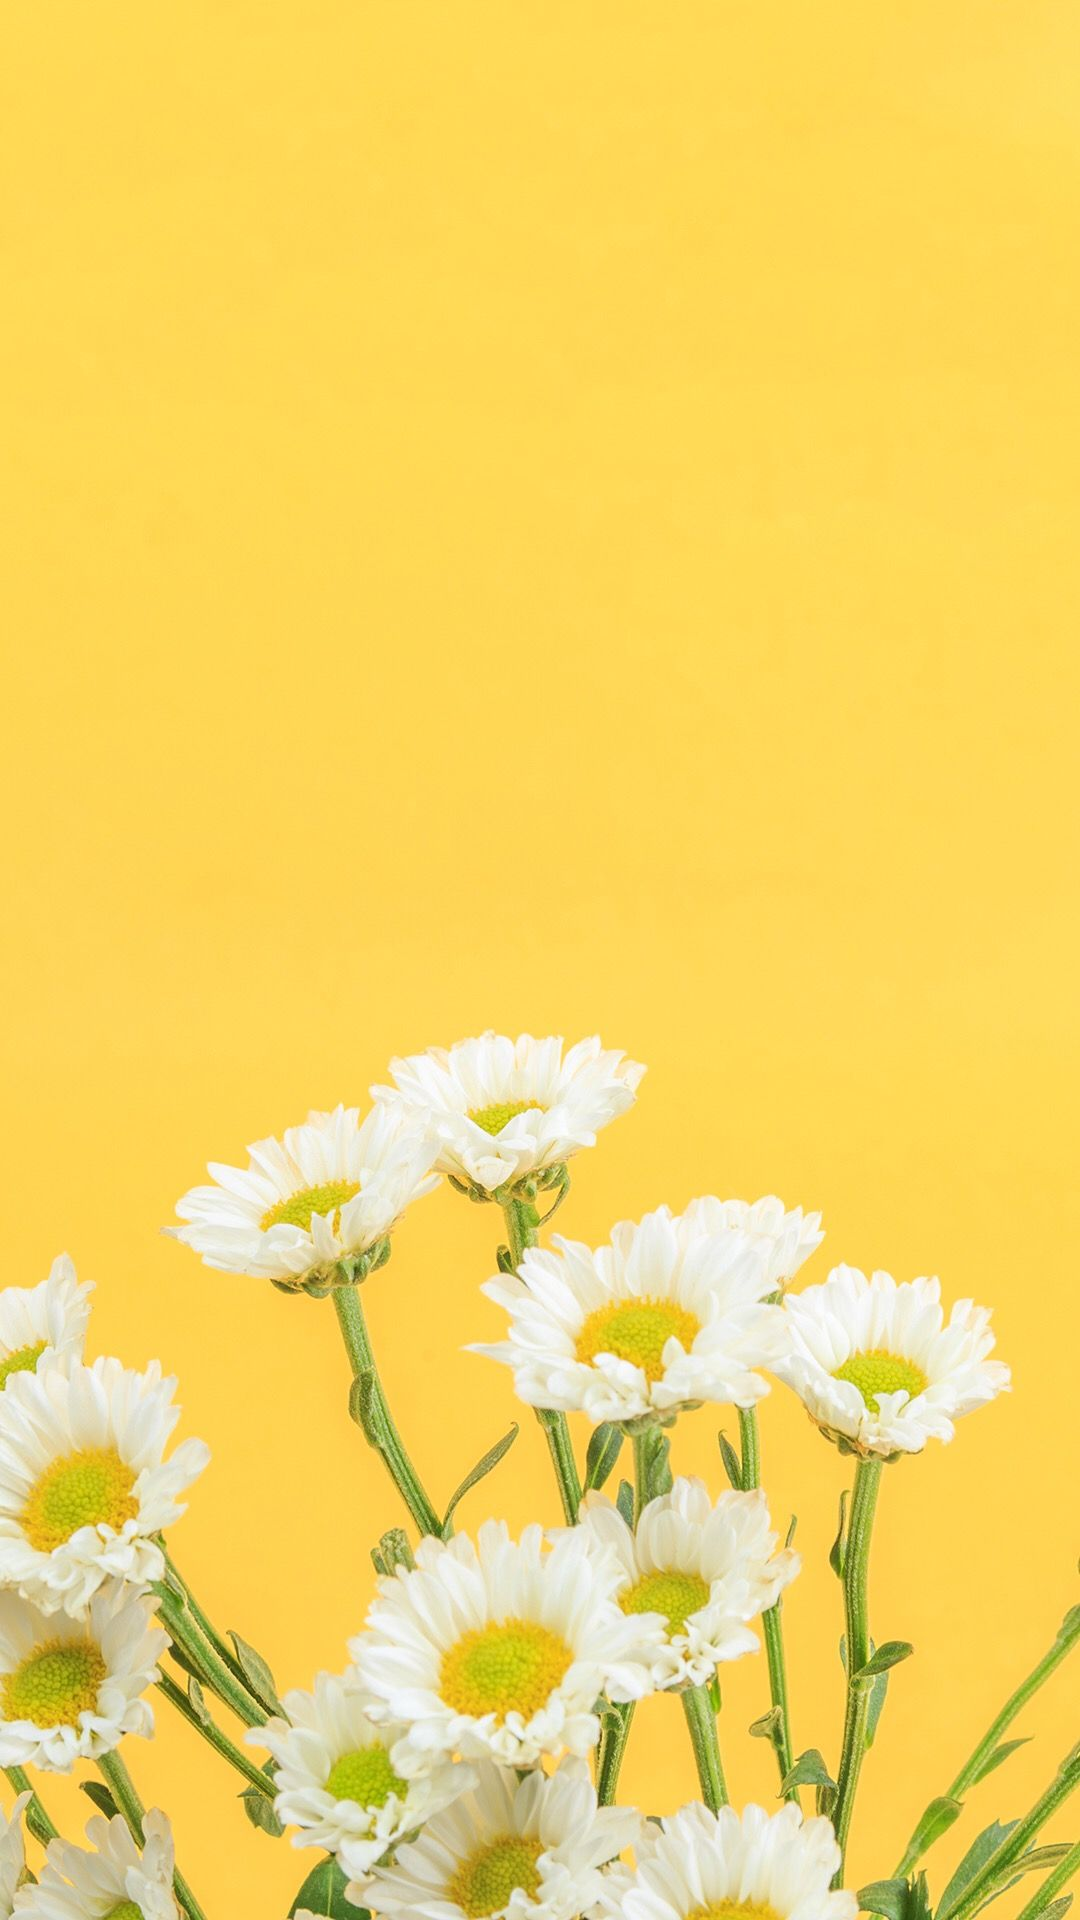 happy daisies ♡ kalfornon การวาดภาพทิวทัศน์, พื้นหลัง